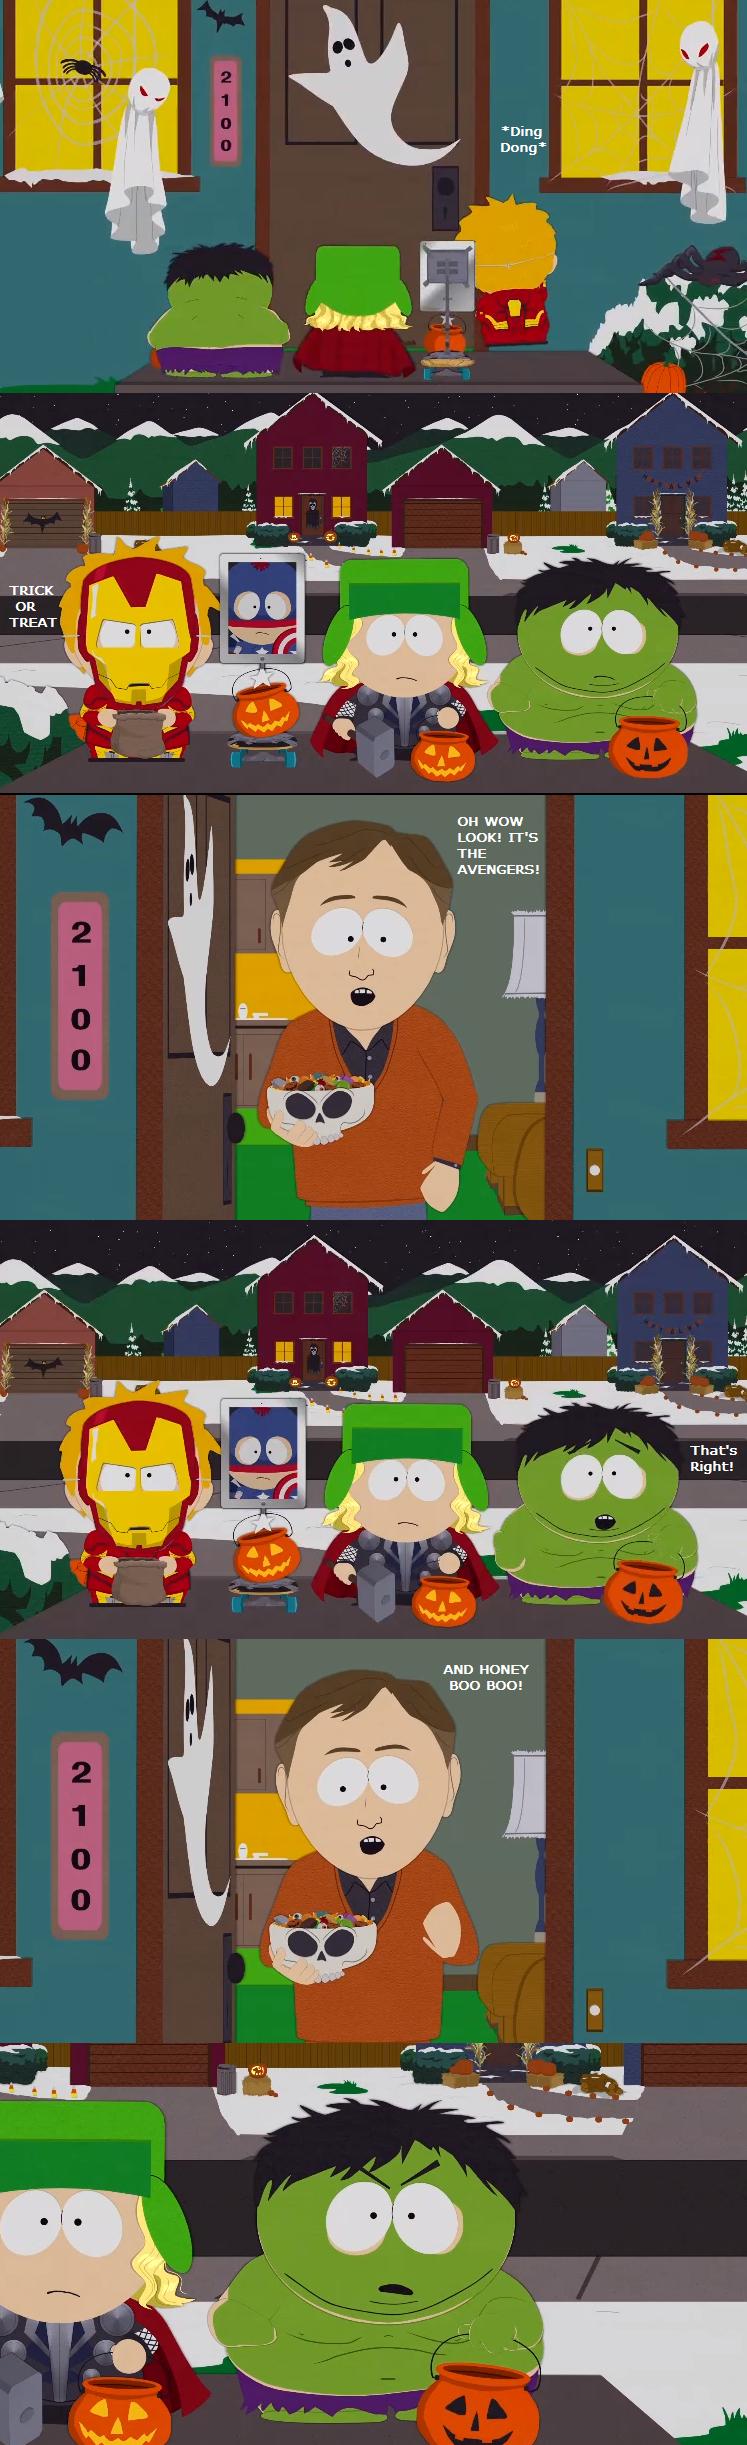 South Park. .